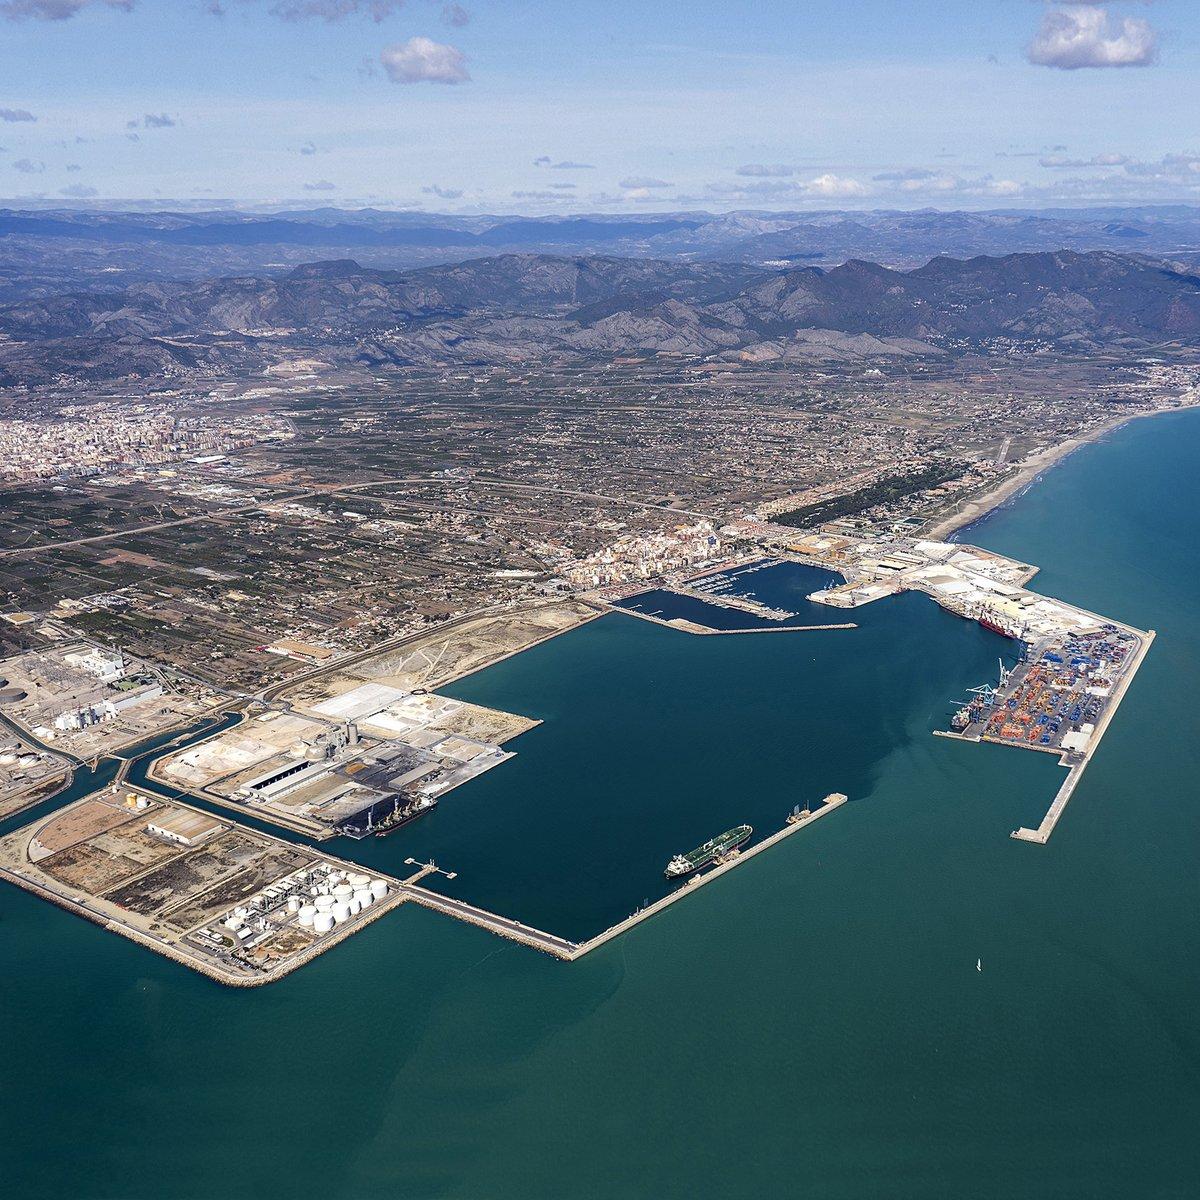 @PuertosEstado y @portcastello consensúan el Plan de Empresa 2020-2024, que contempla una inversión de 93,2 M€. https://t.co/KTIQWNygAE https://t.co/AggQ6kJO40